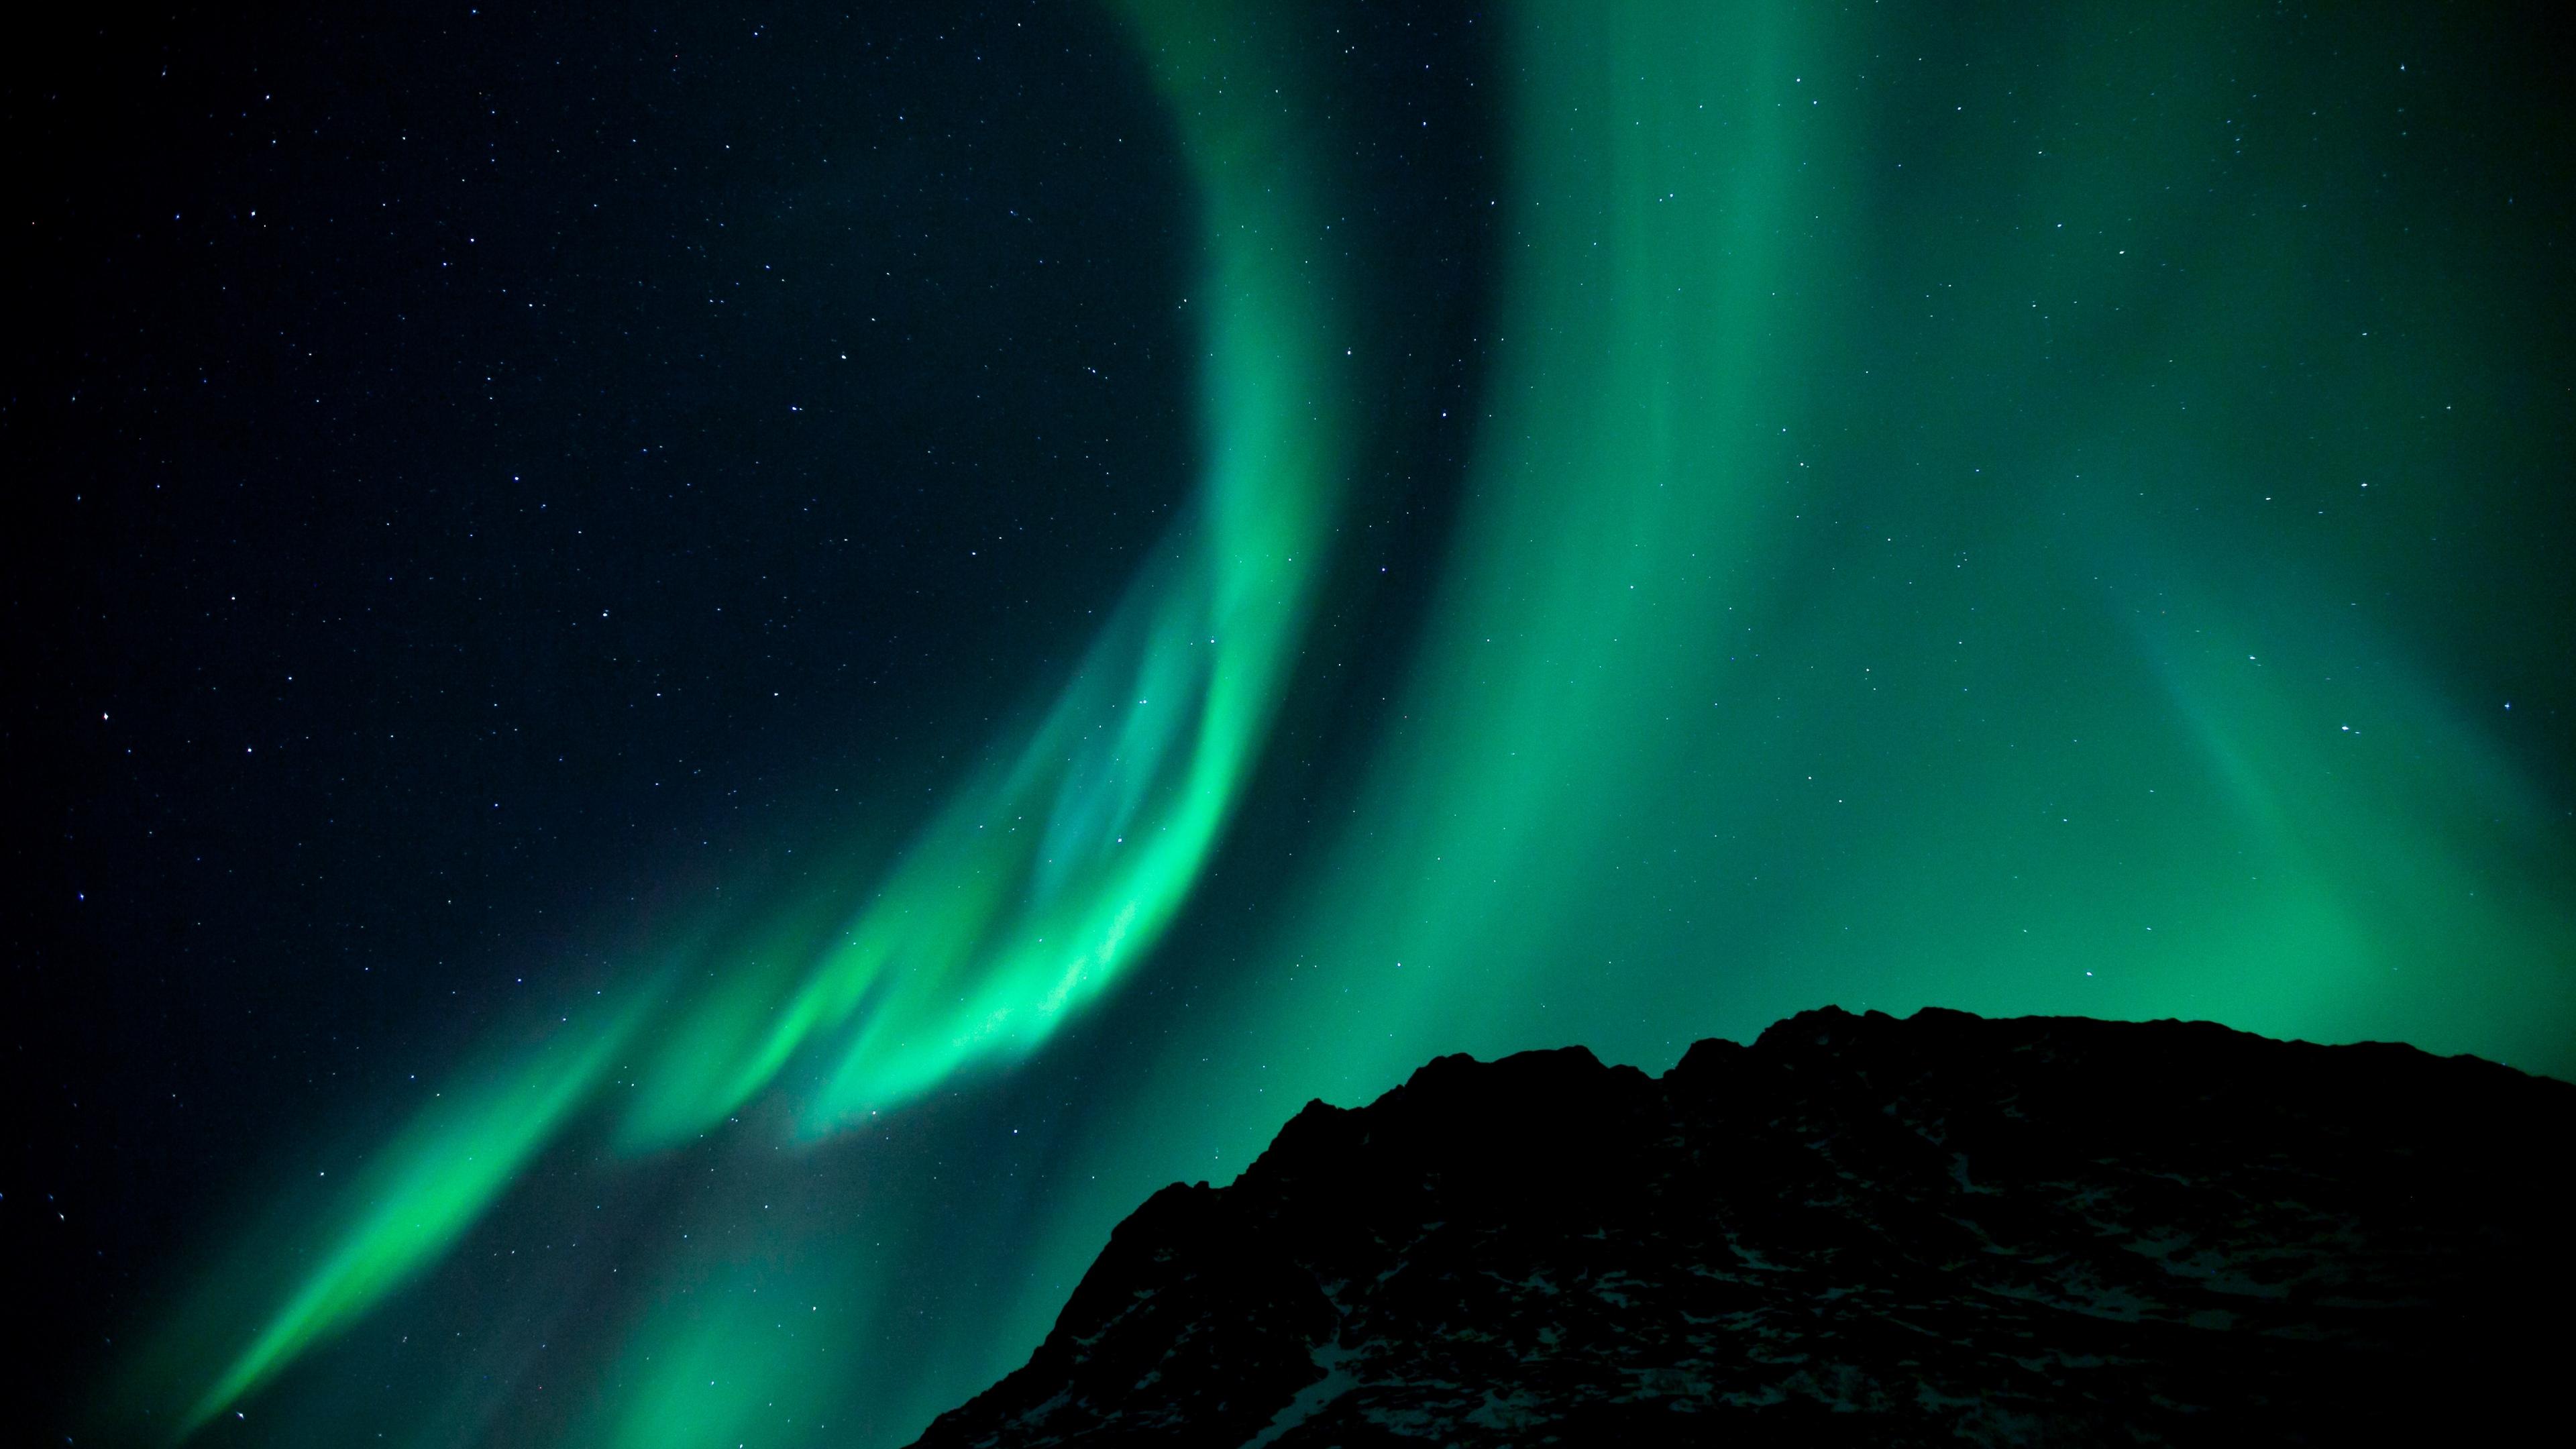 northern lights night night sky phenomenon 4k 1539370561 - northern lights, night, night sky, phenomenon 4k - northern lights, night sky, Night